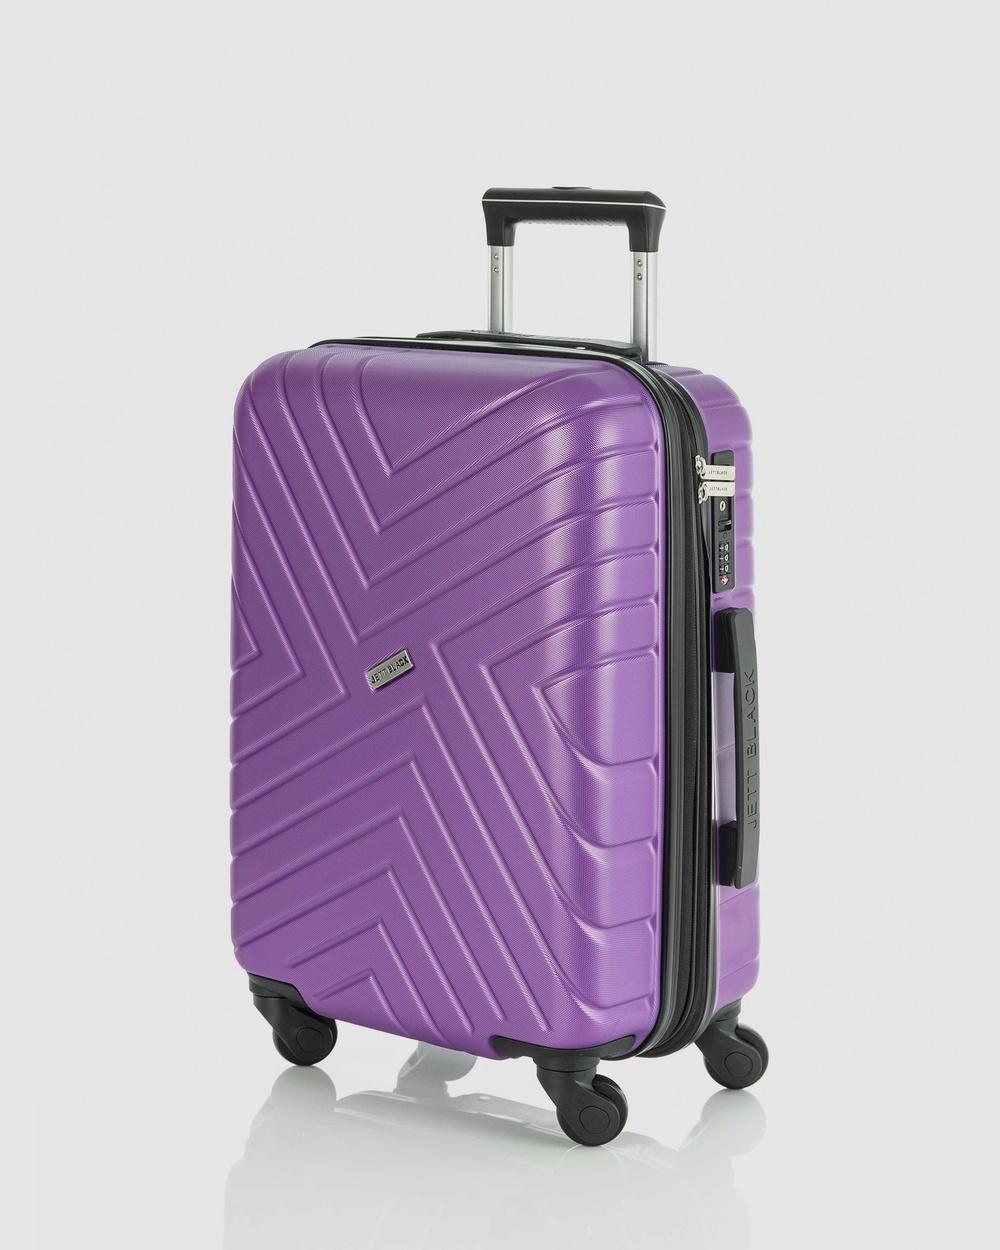 JETT BLACK Maze Carry On Suitcase Bags Purple